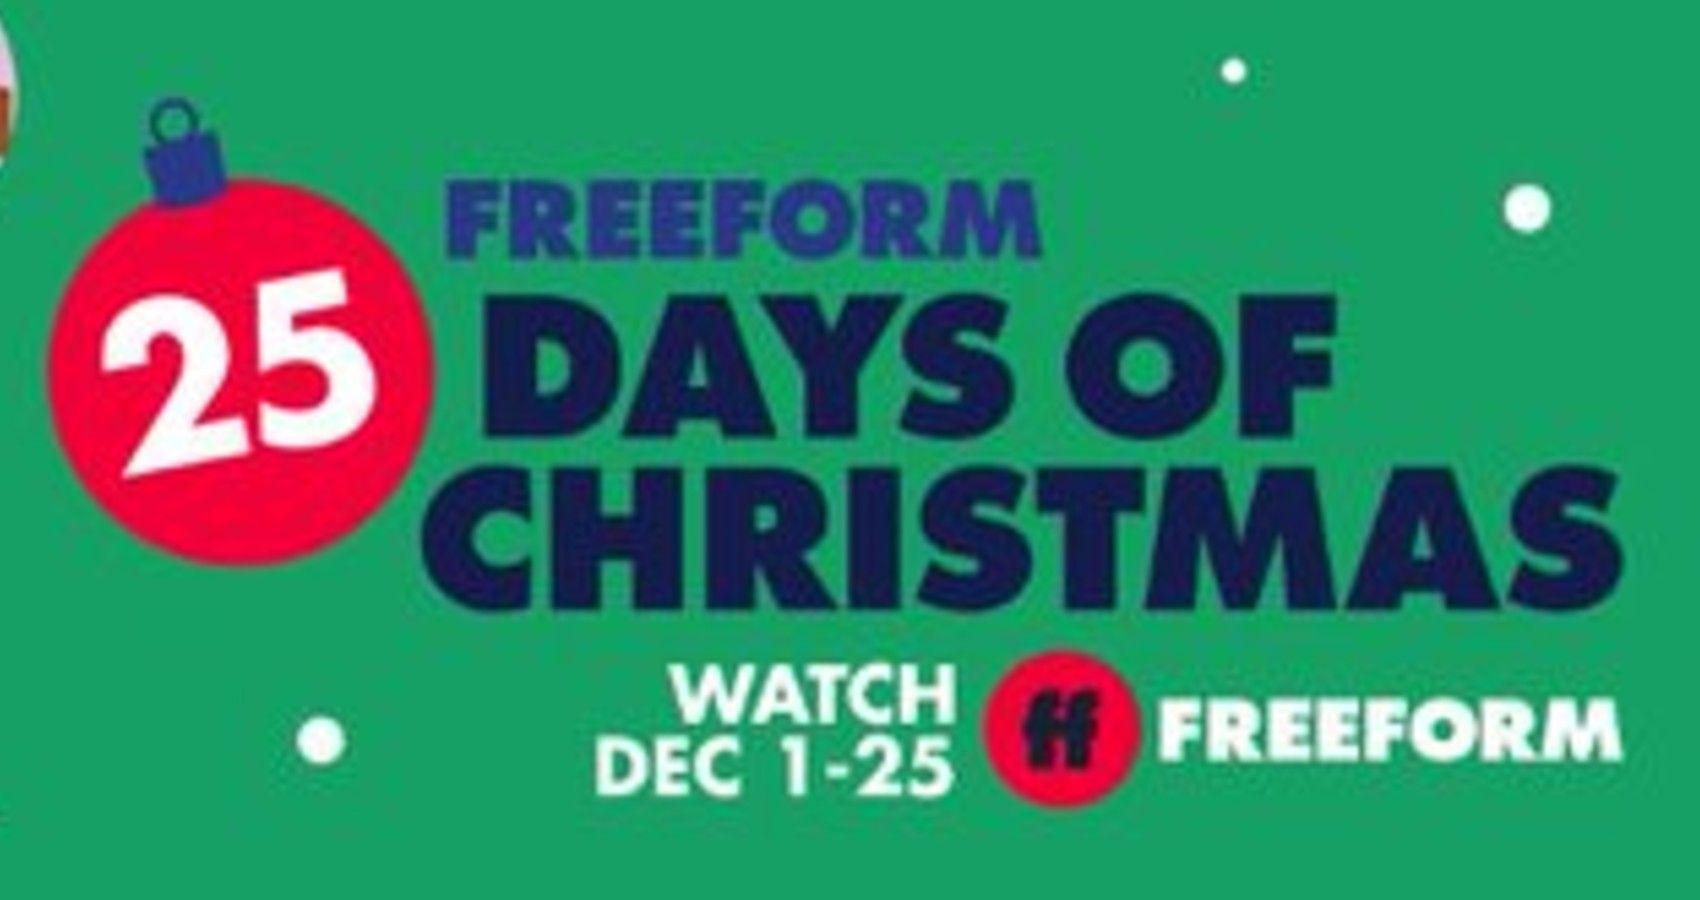 Freeform: '25 Days Of Christmas' Schedule | Moms.com